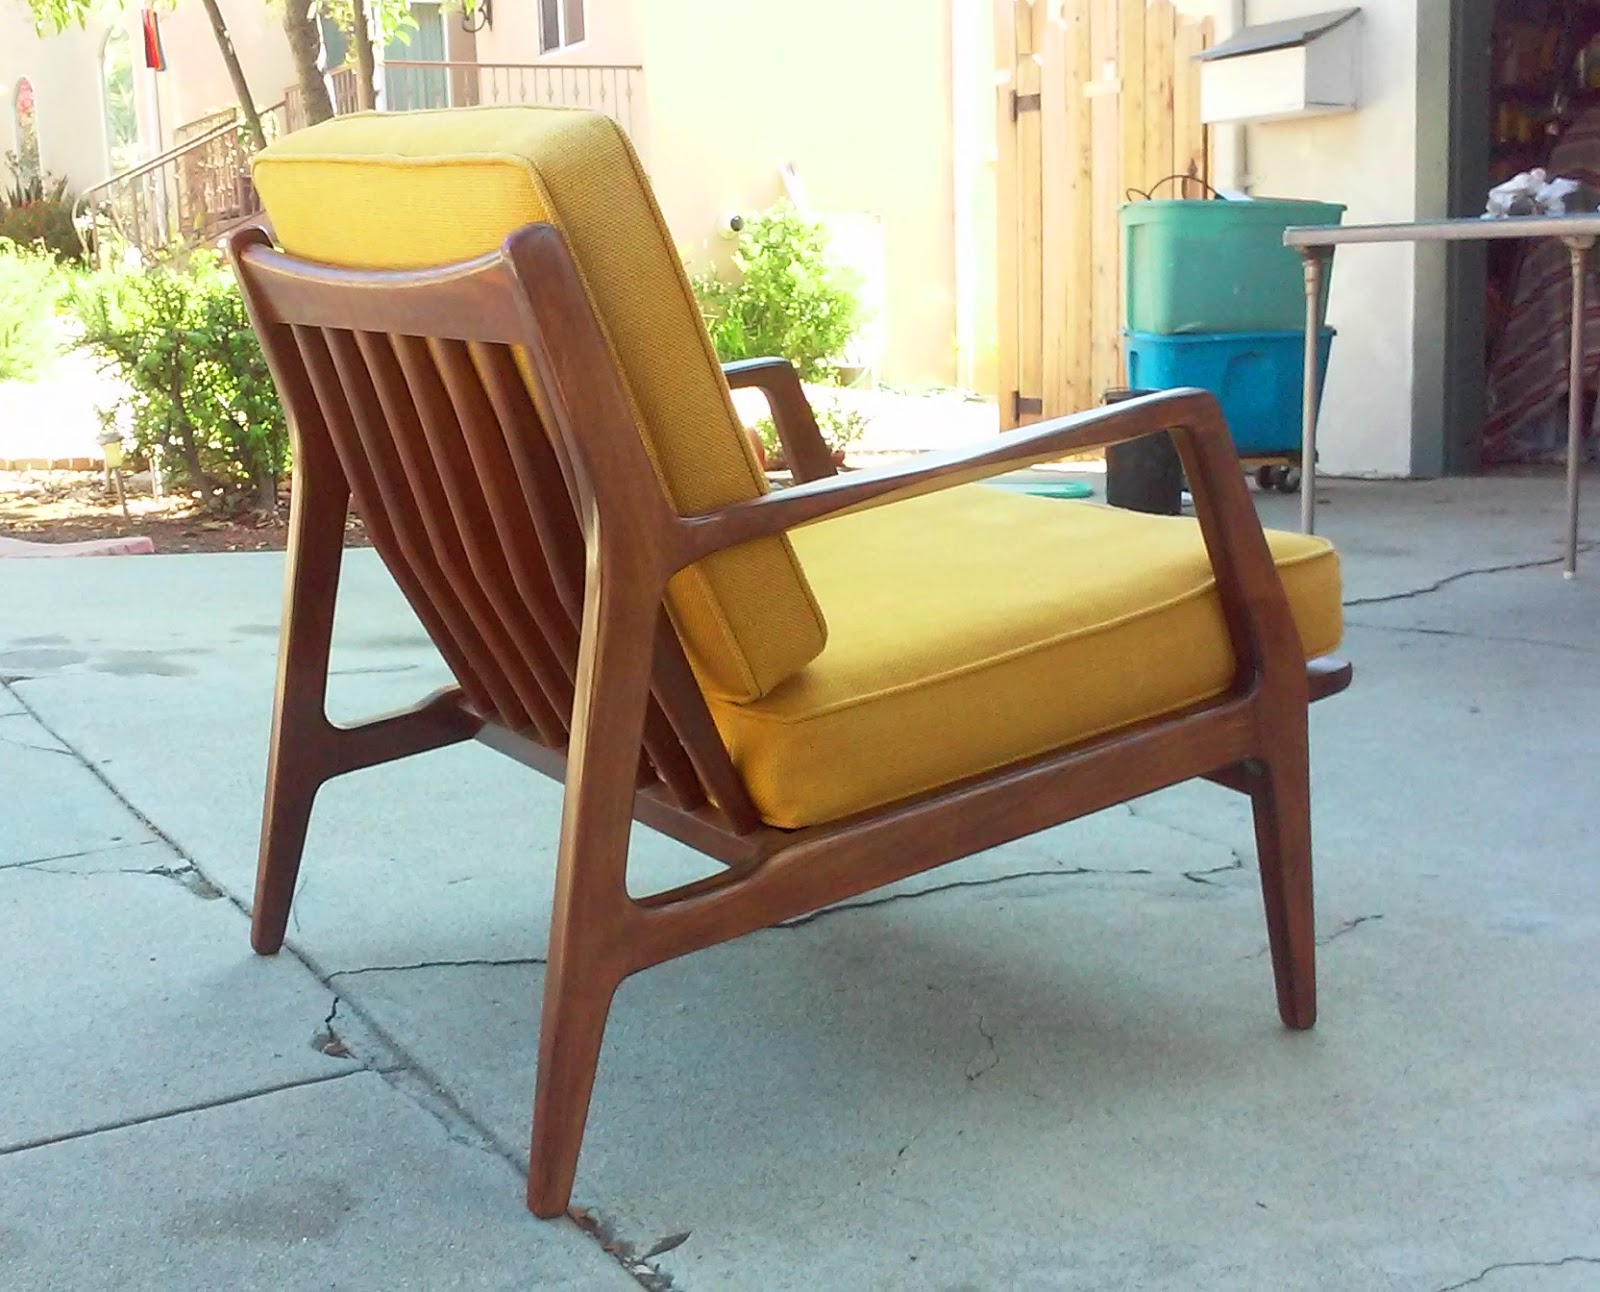 Vintage Mid Century Furniture SOLD Vintage